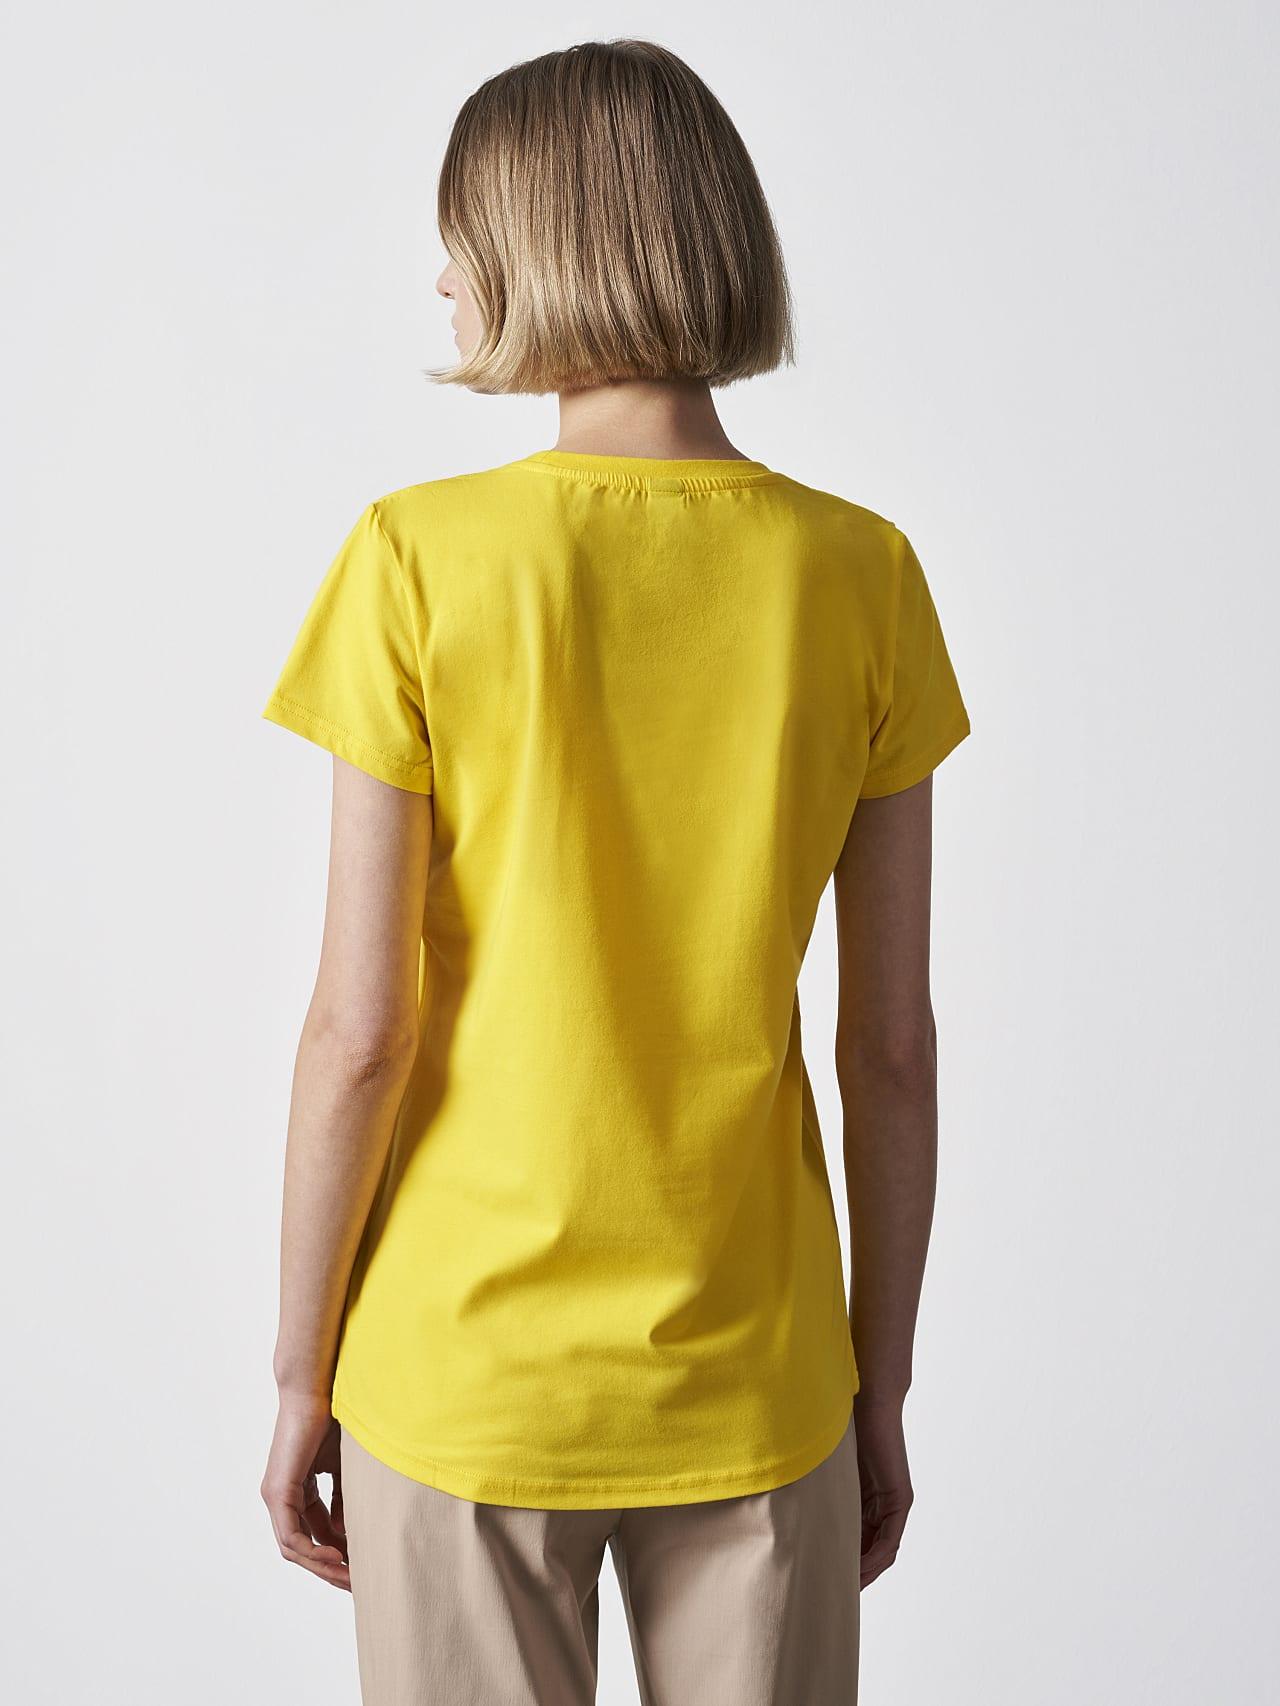 JERU V2.Y4.02 Signature Logo T-Shirt yellow Front Main Alpha Tauri